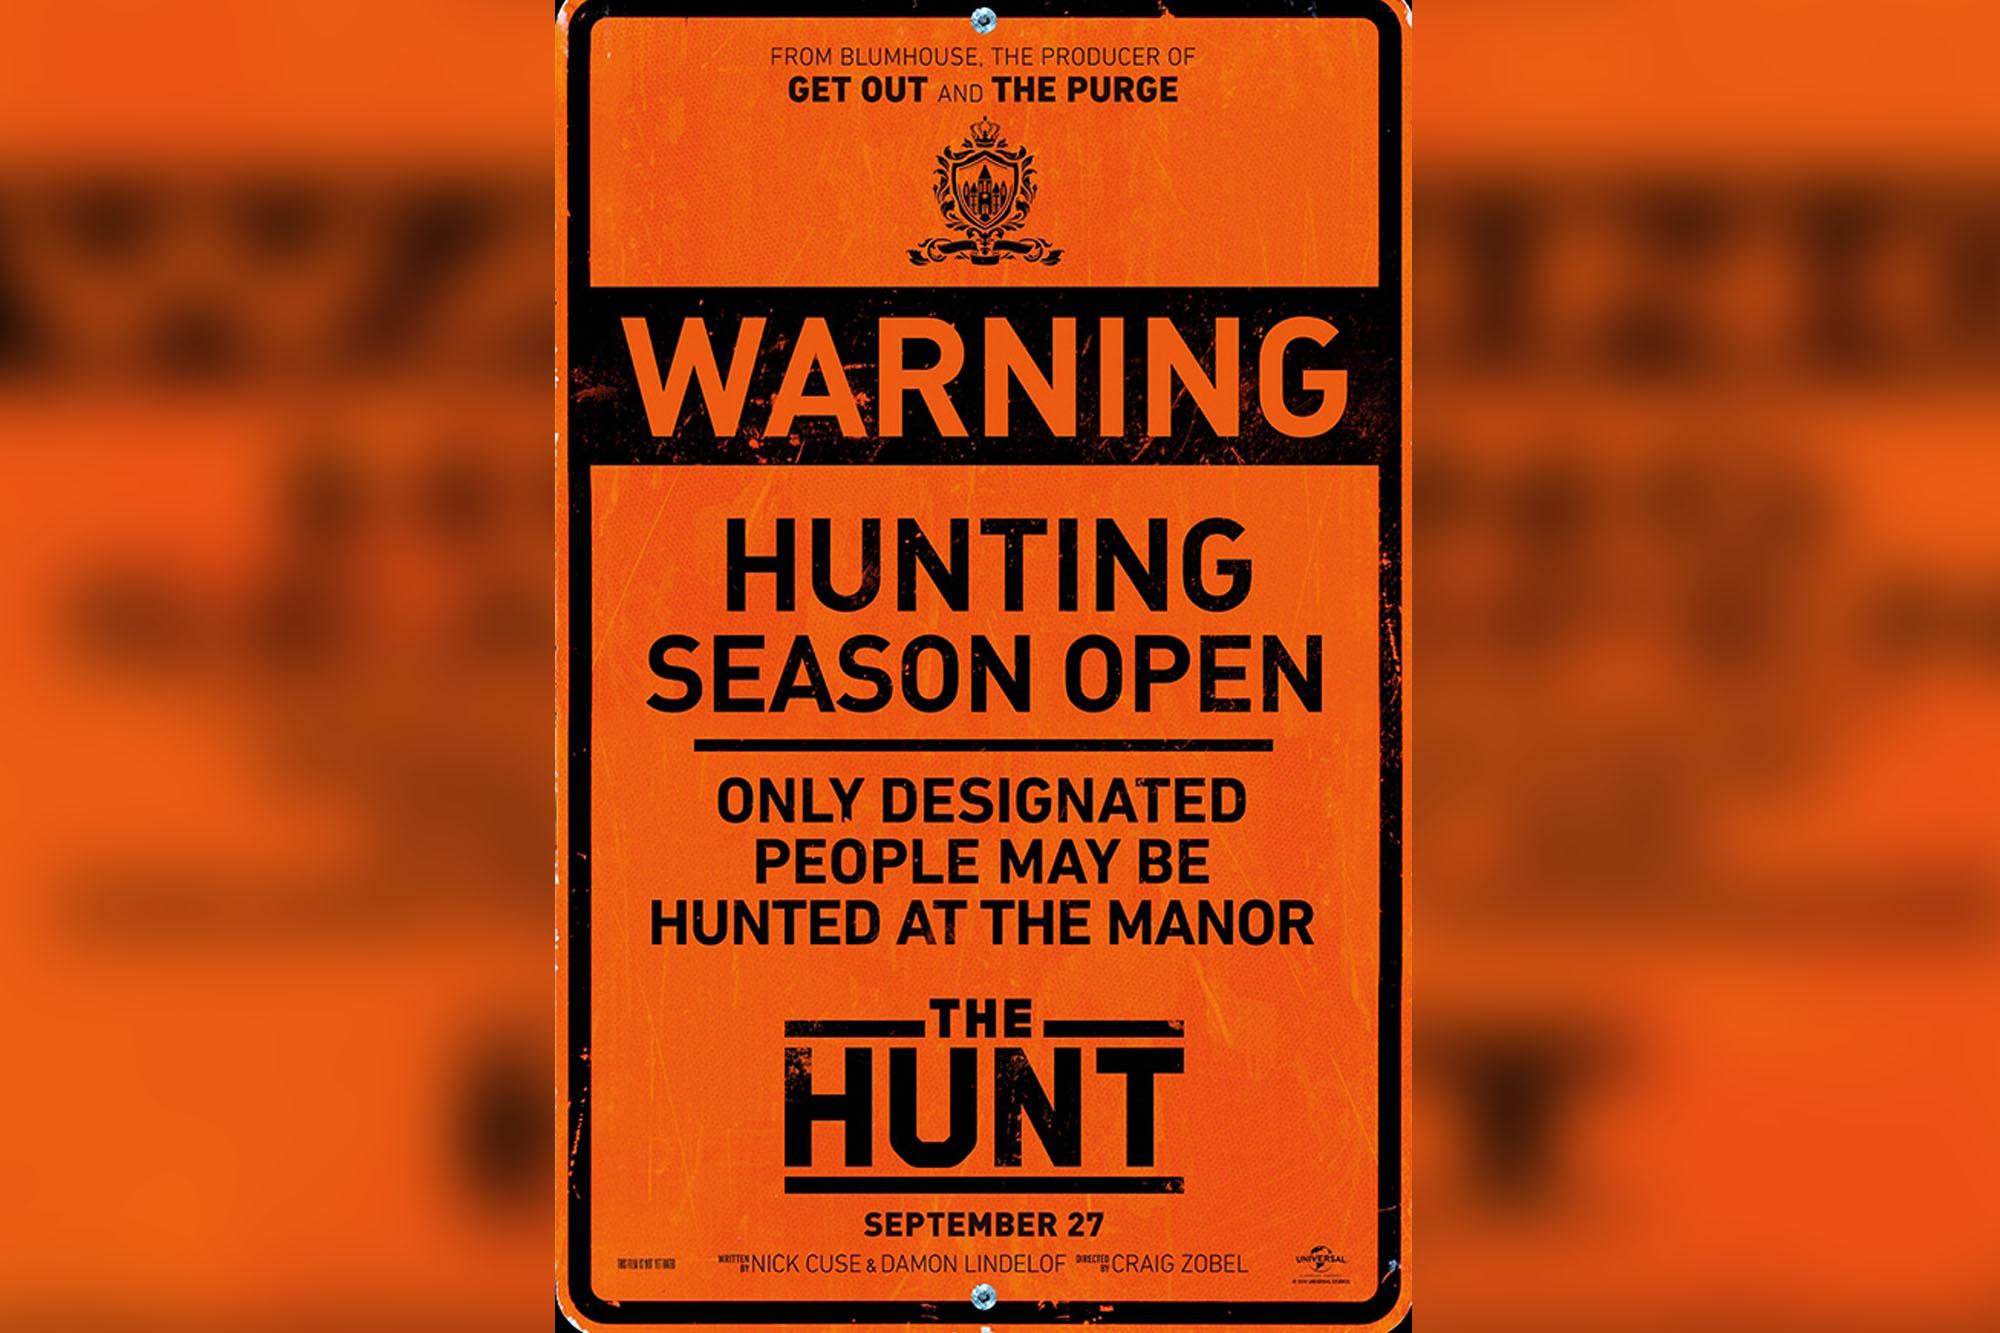 the hunt movie targeting deplorables